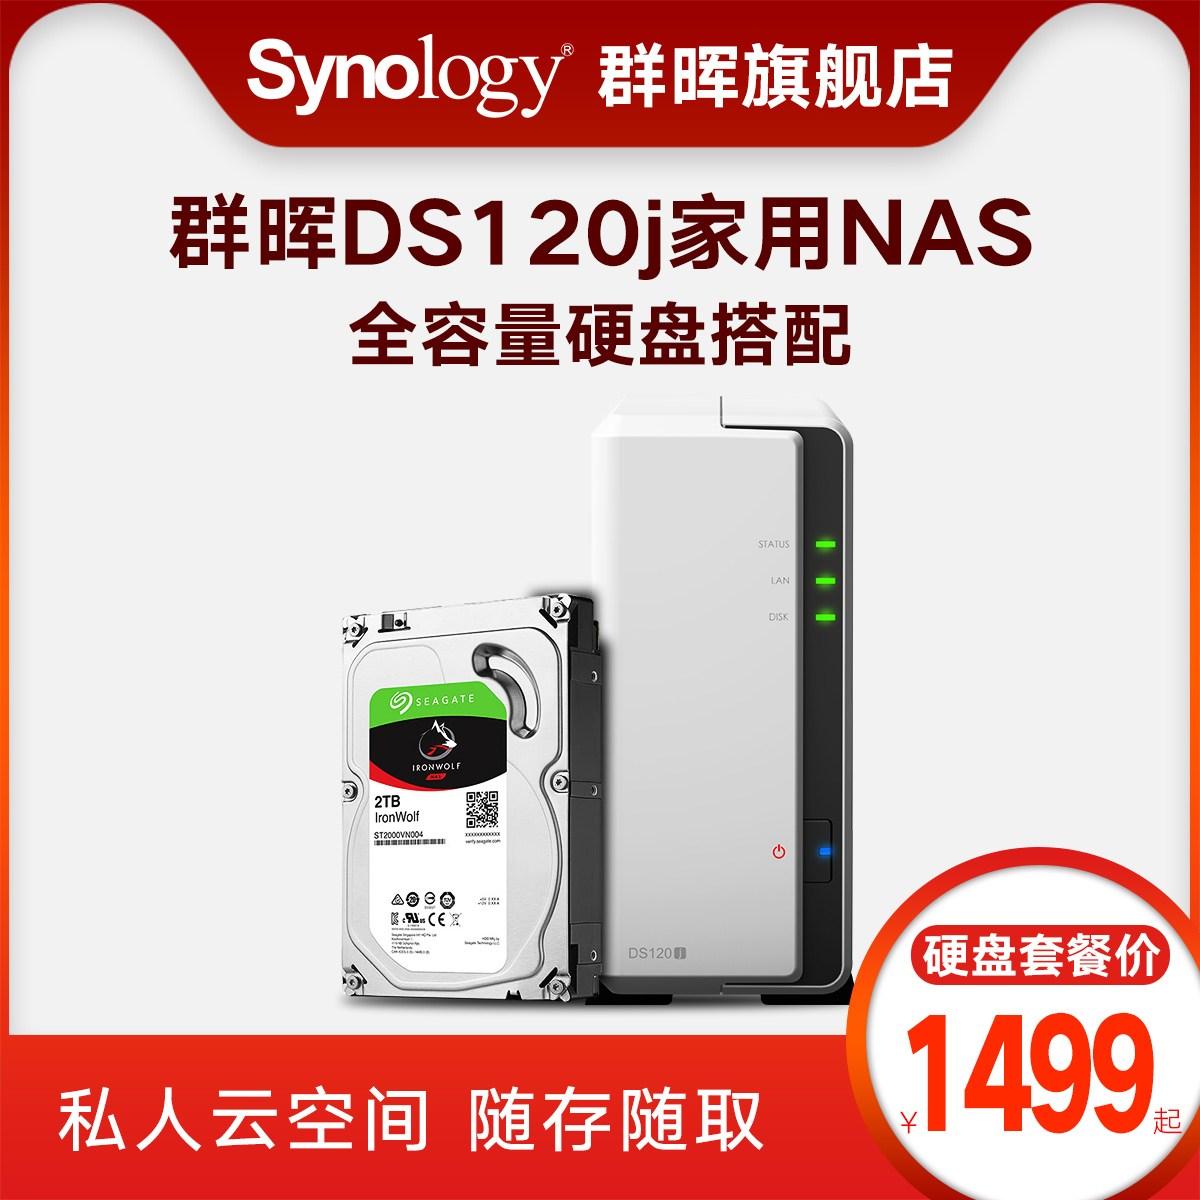 NAS듀얼 ()(뉴타입 출시)Synology DS120j싱글디스크 NAS가정 저축 서버 PrivateClouds클라우드 DS119j업그레이드, T02-DS120J+2T